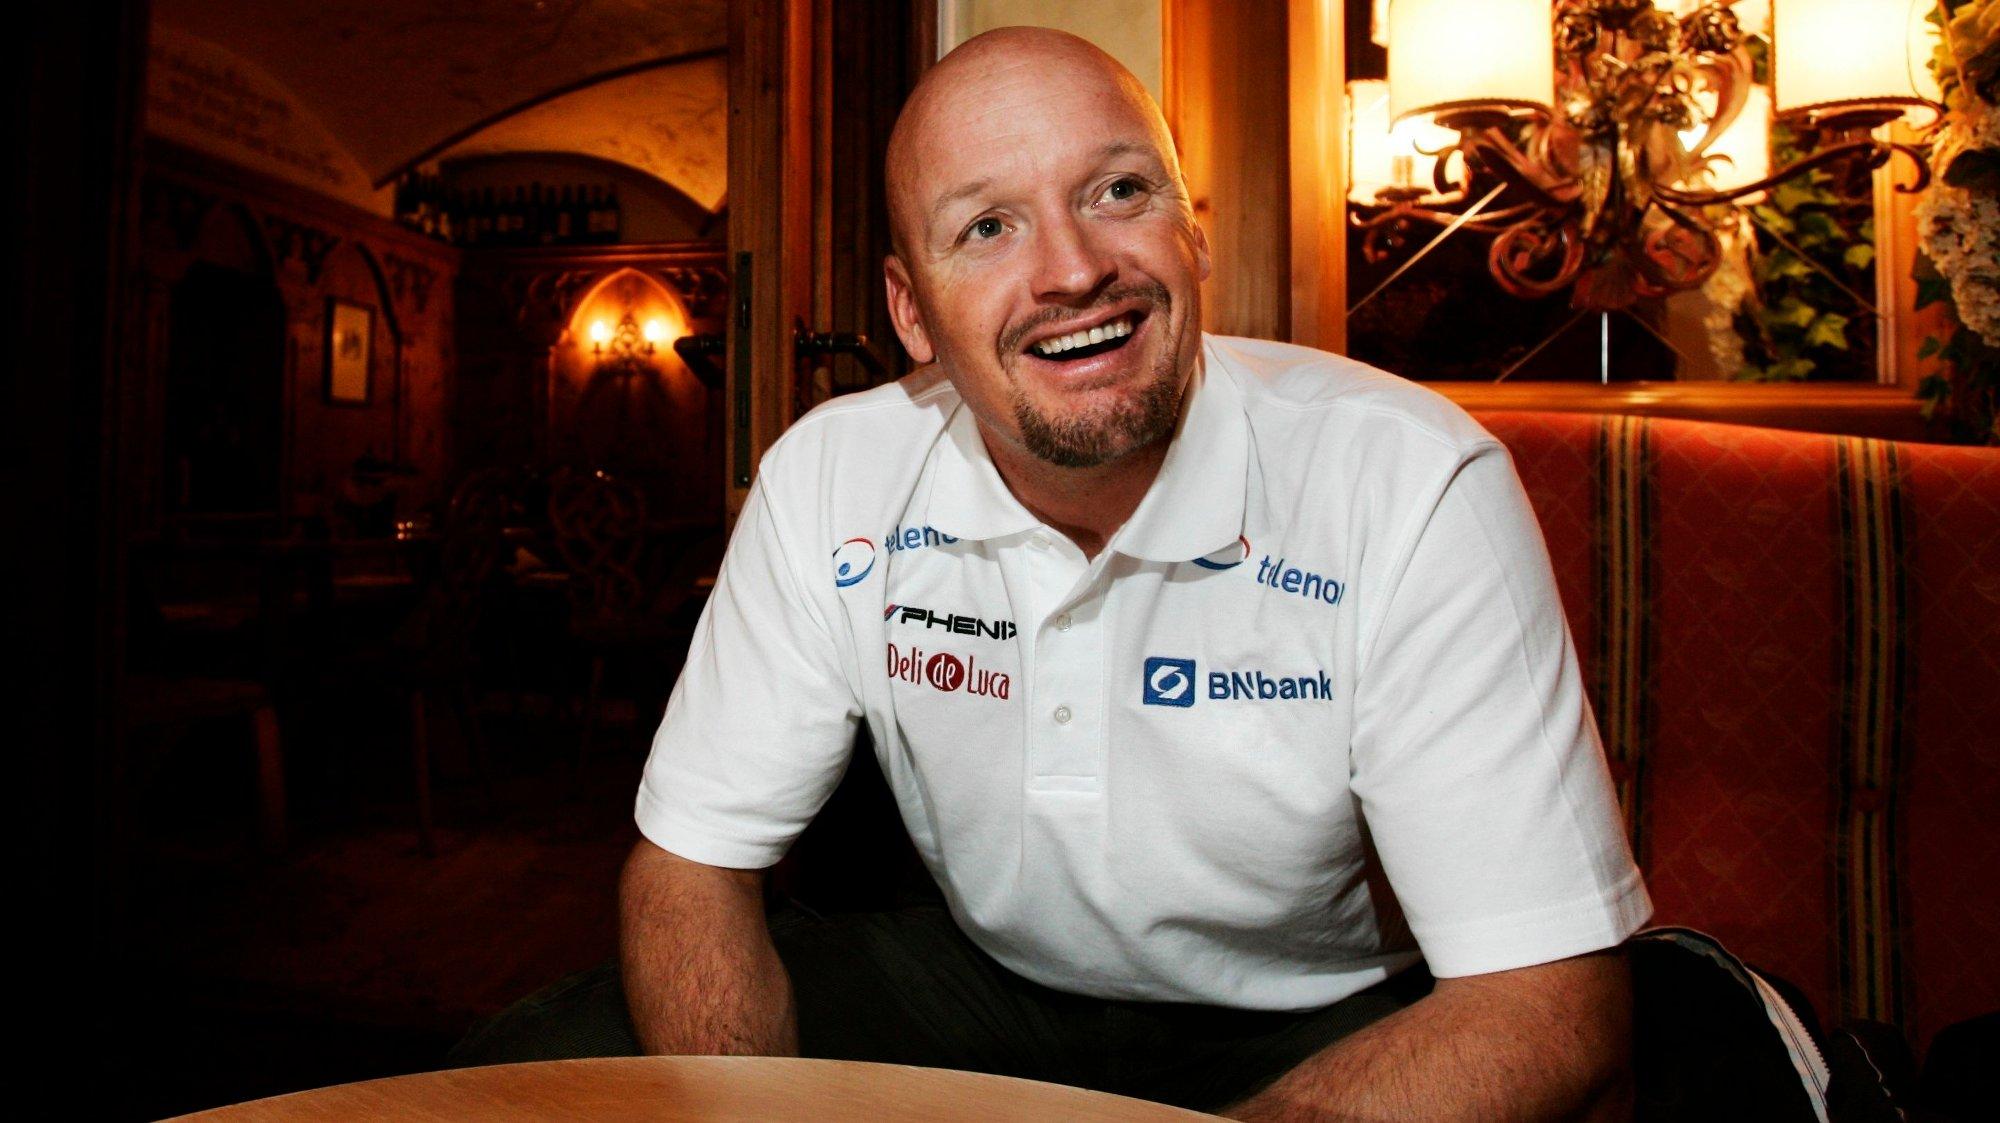 Finn Kristian Jagge